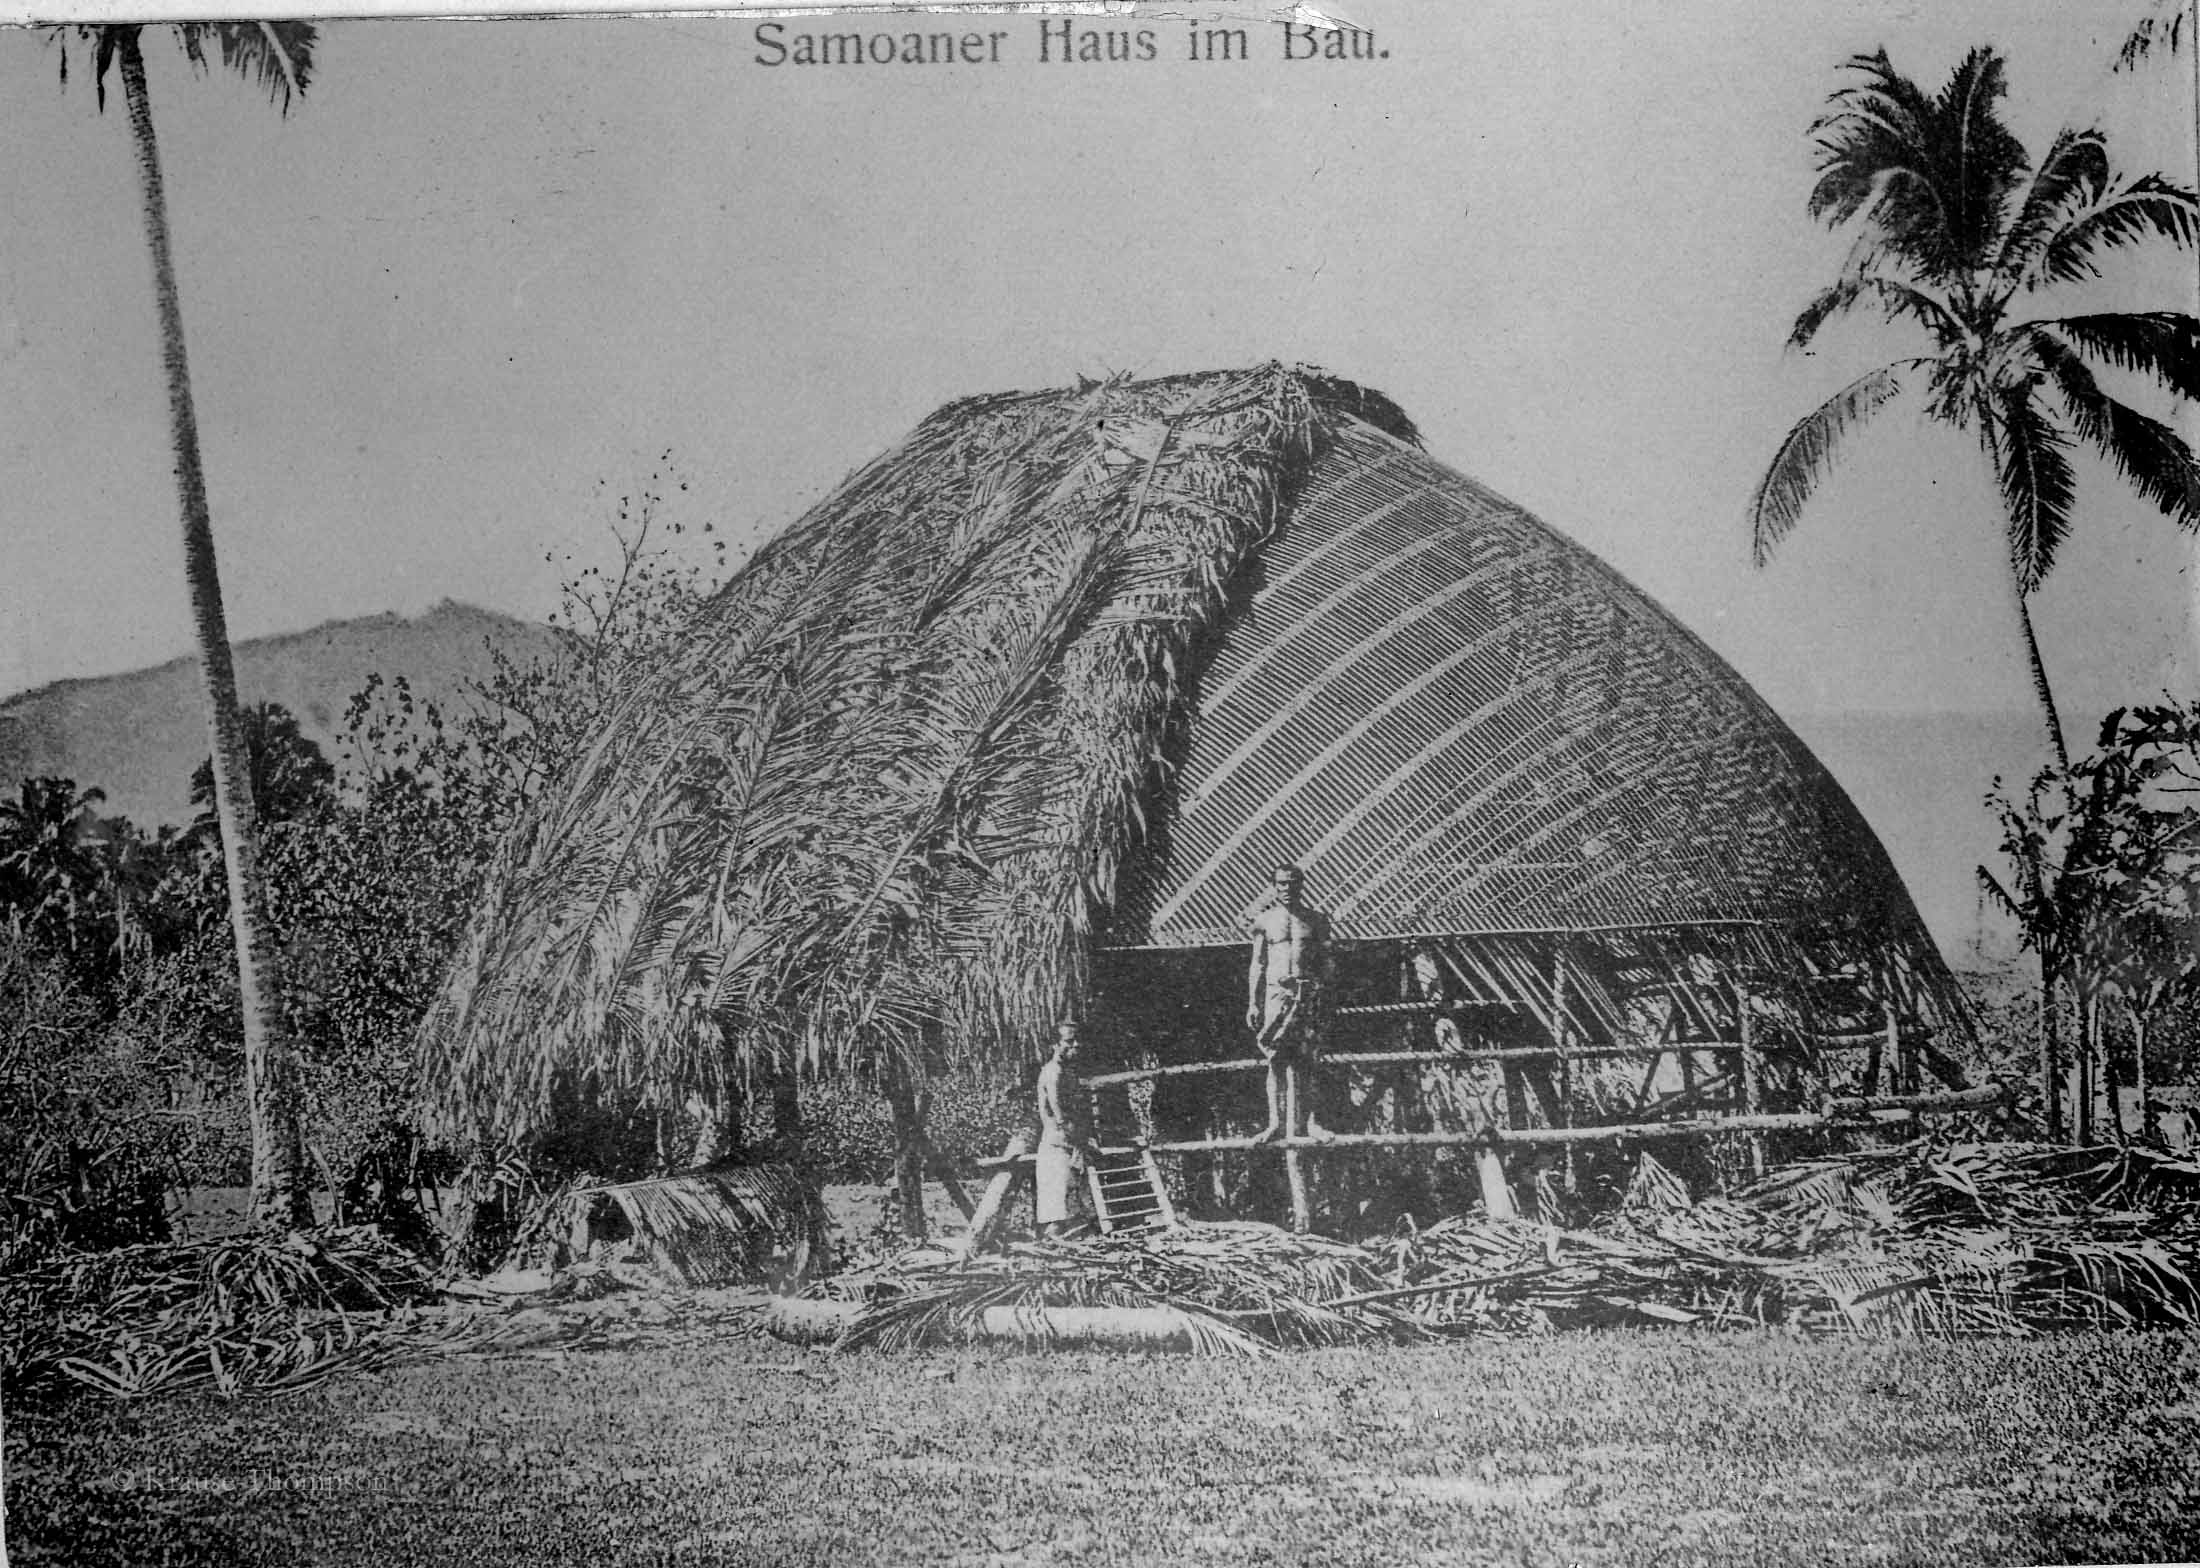 Samoan house under construction